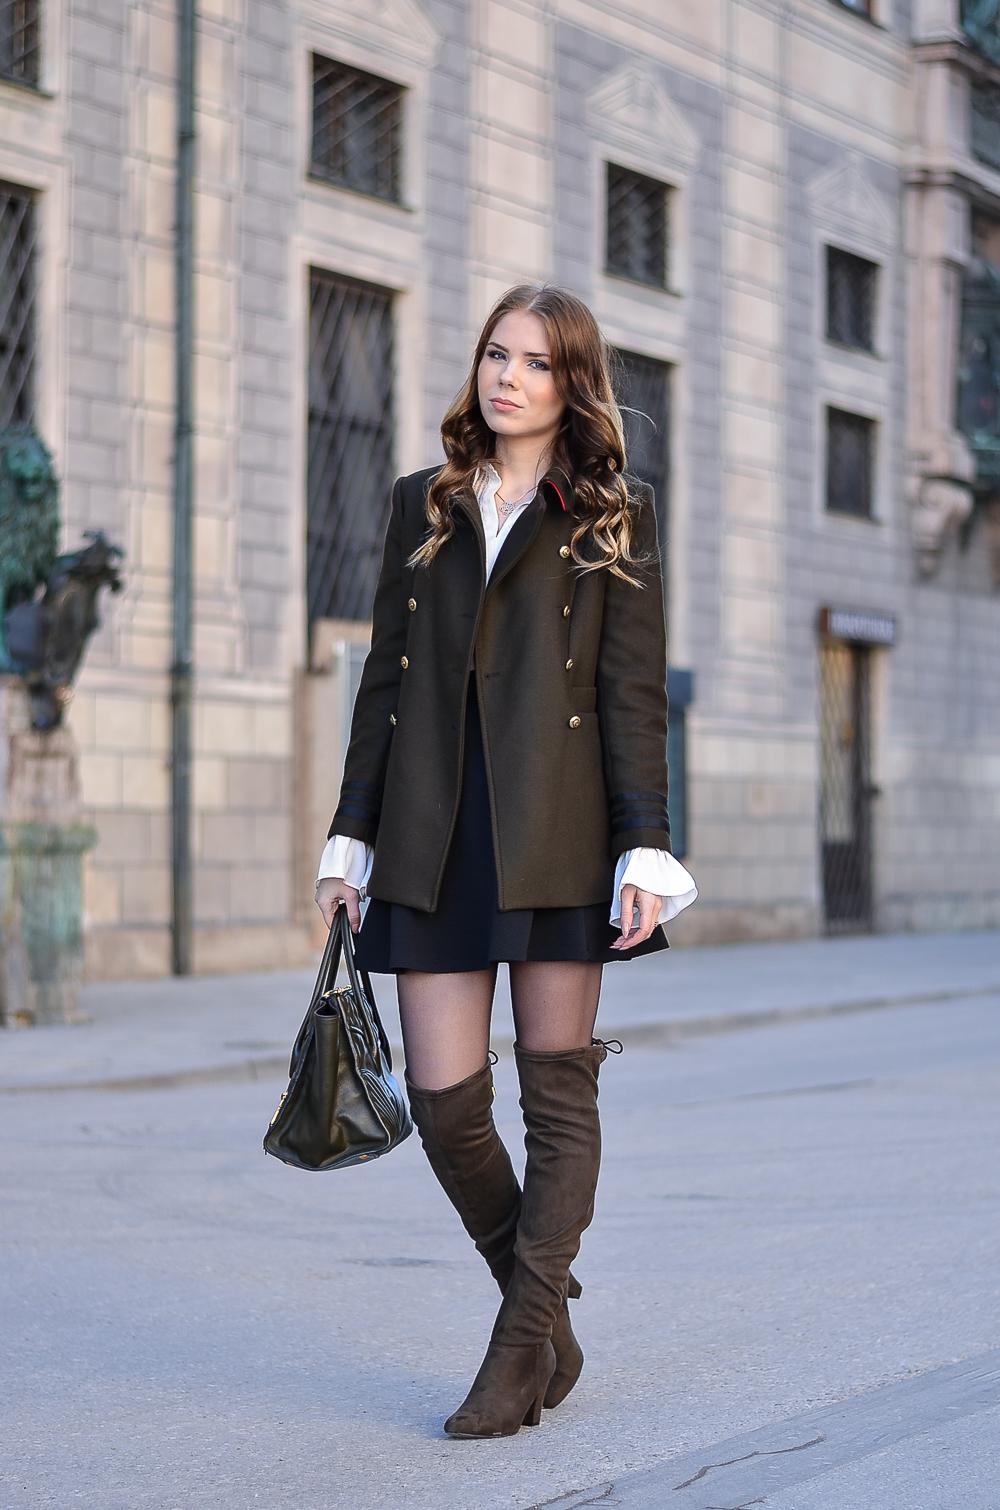 Military Jacket-goldene Knöpfe-Zara Jacke-khaki-Trompetenärmel-Rock-hohe Stiefel-Designer Bag Miu Miu-Fashion Blog